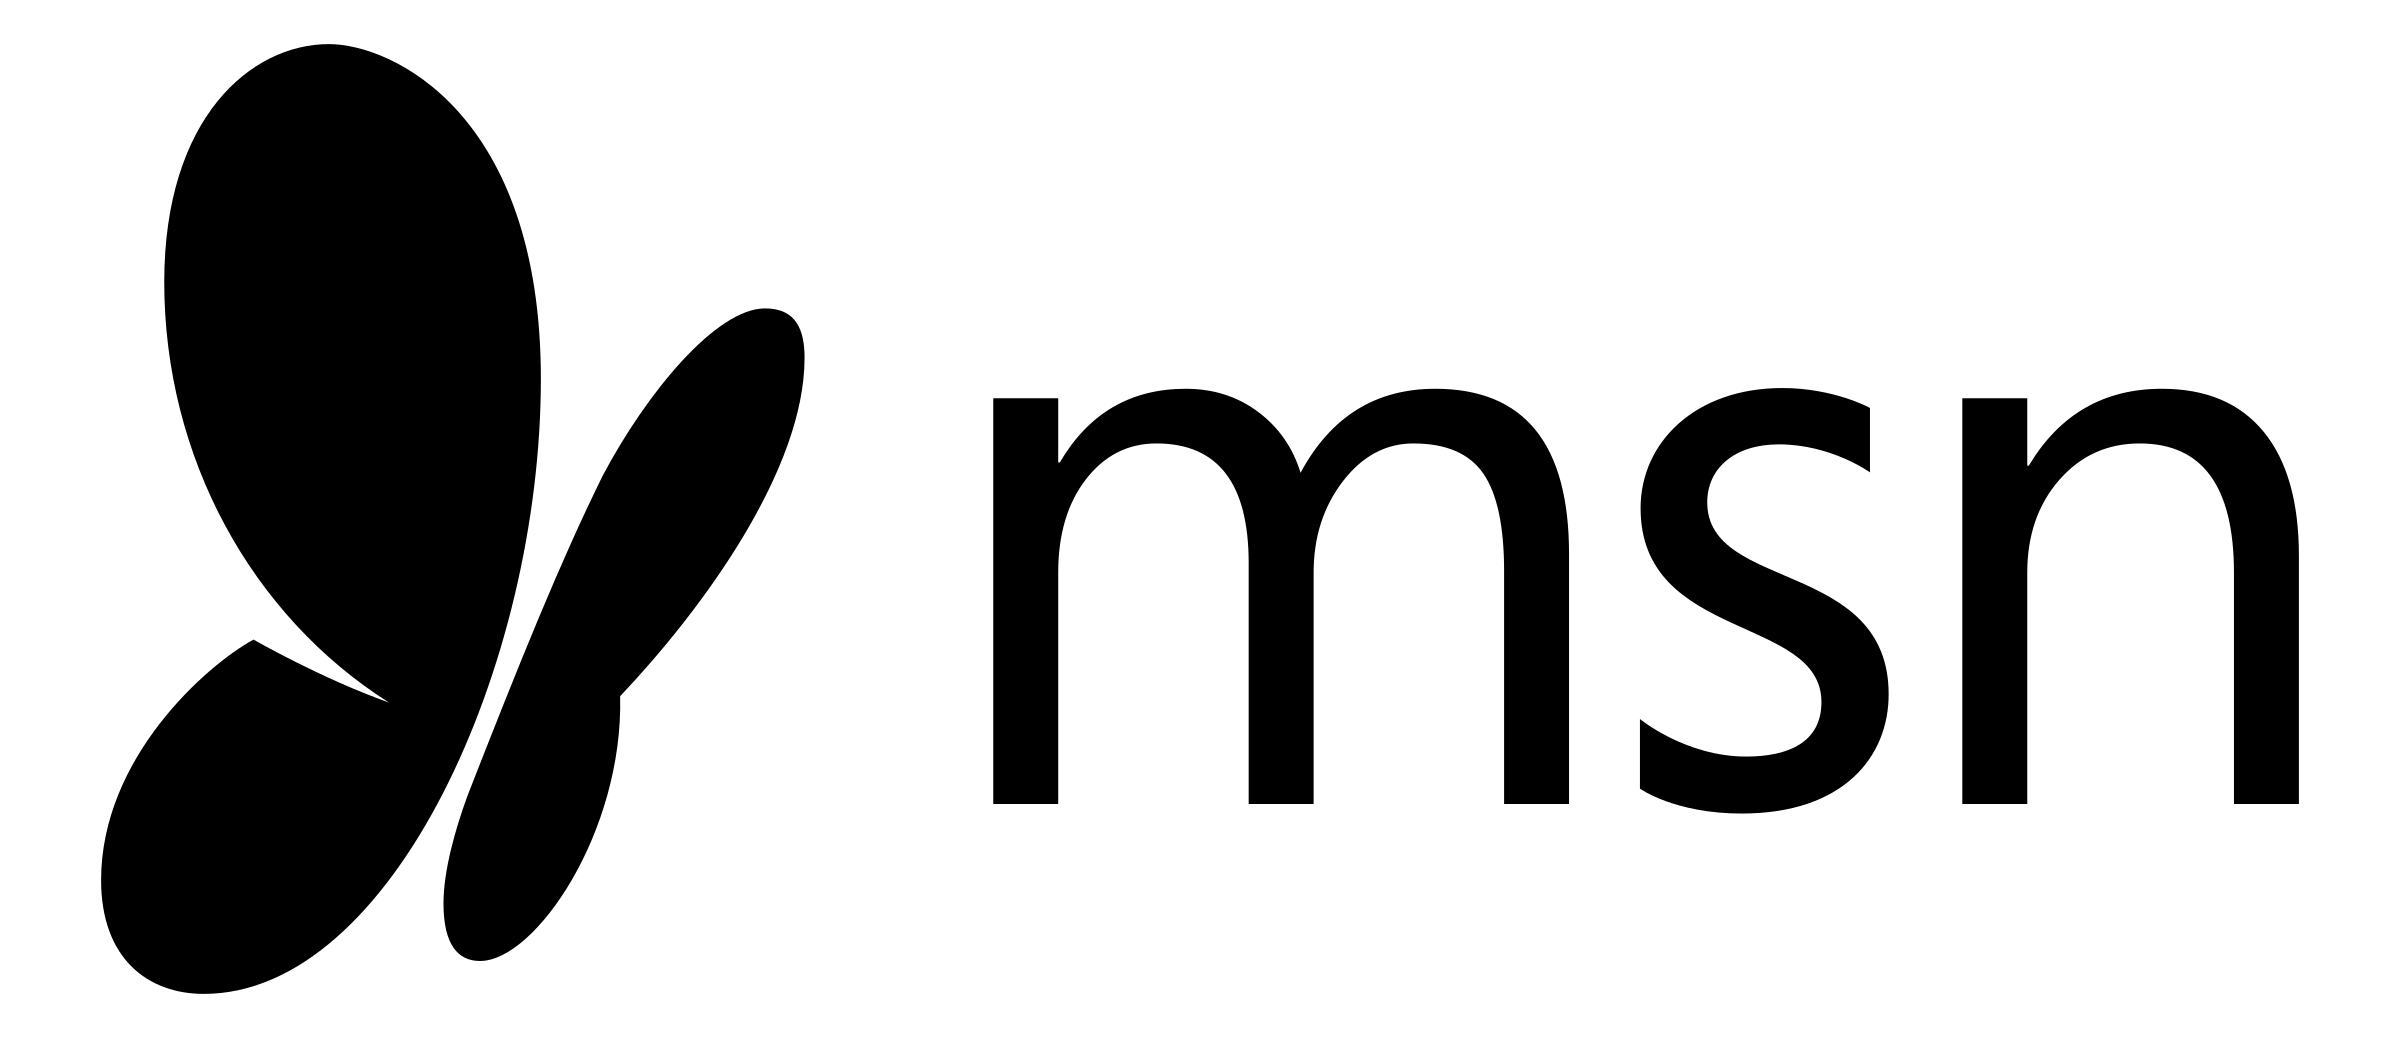 Transparent MSN logo in black.